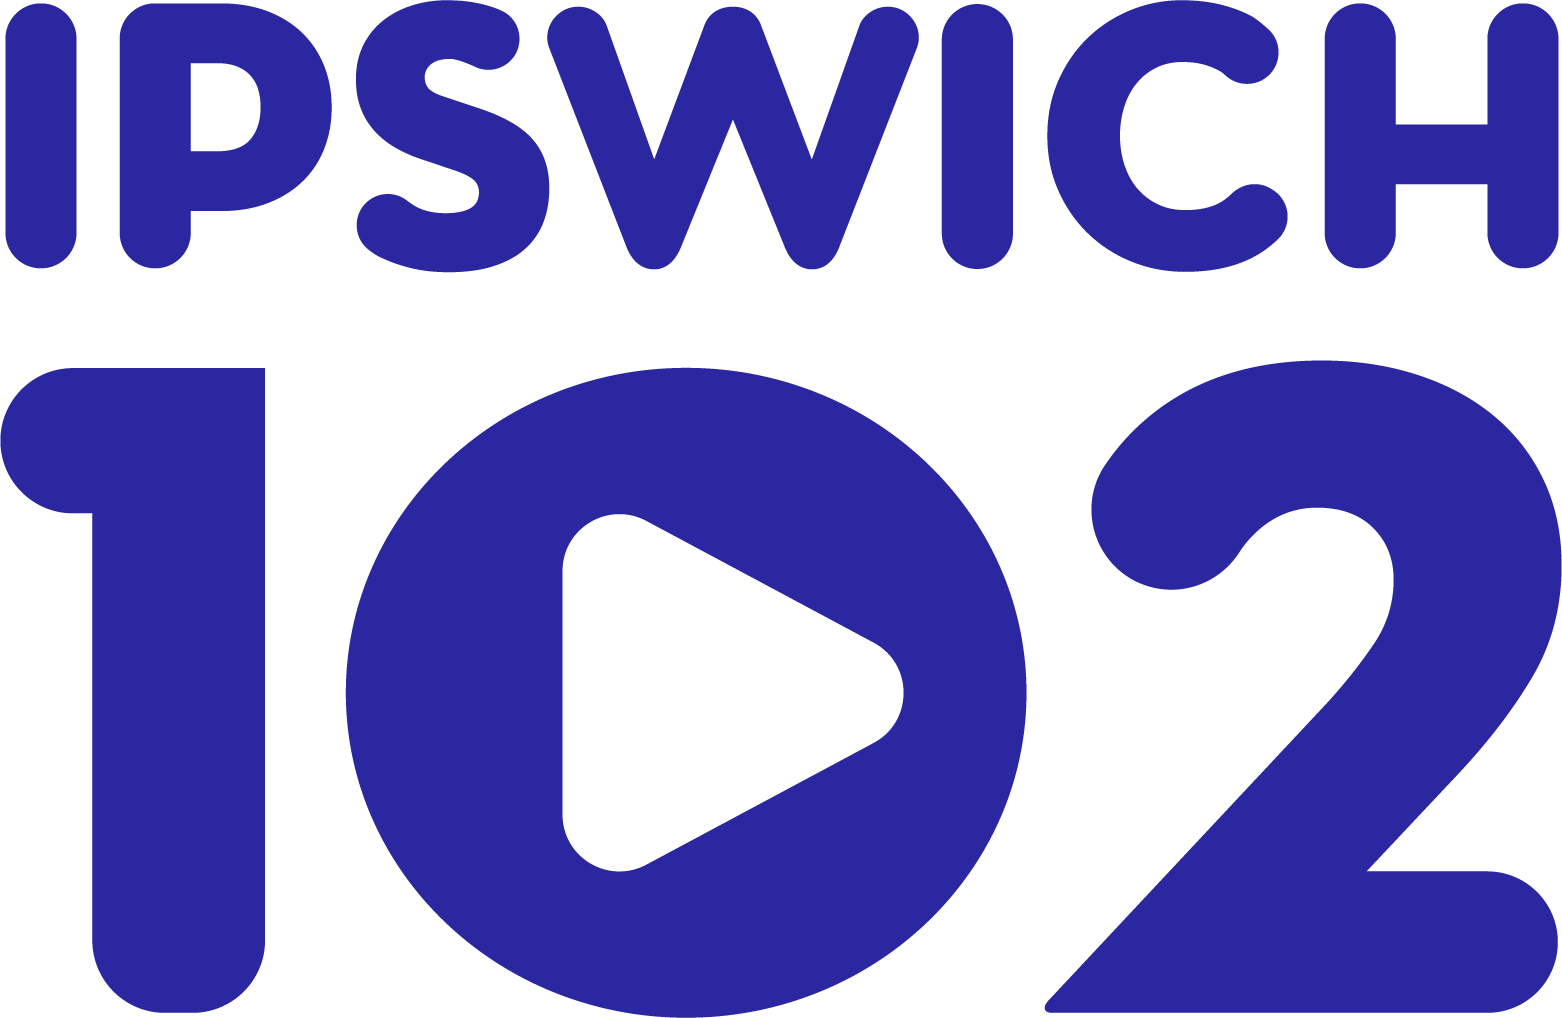 Ipswich 102 logo